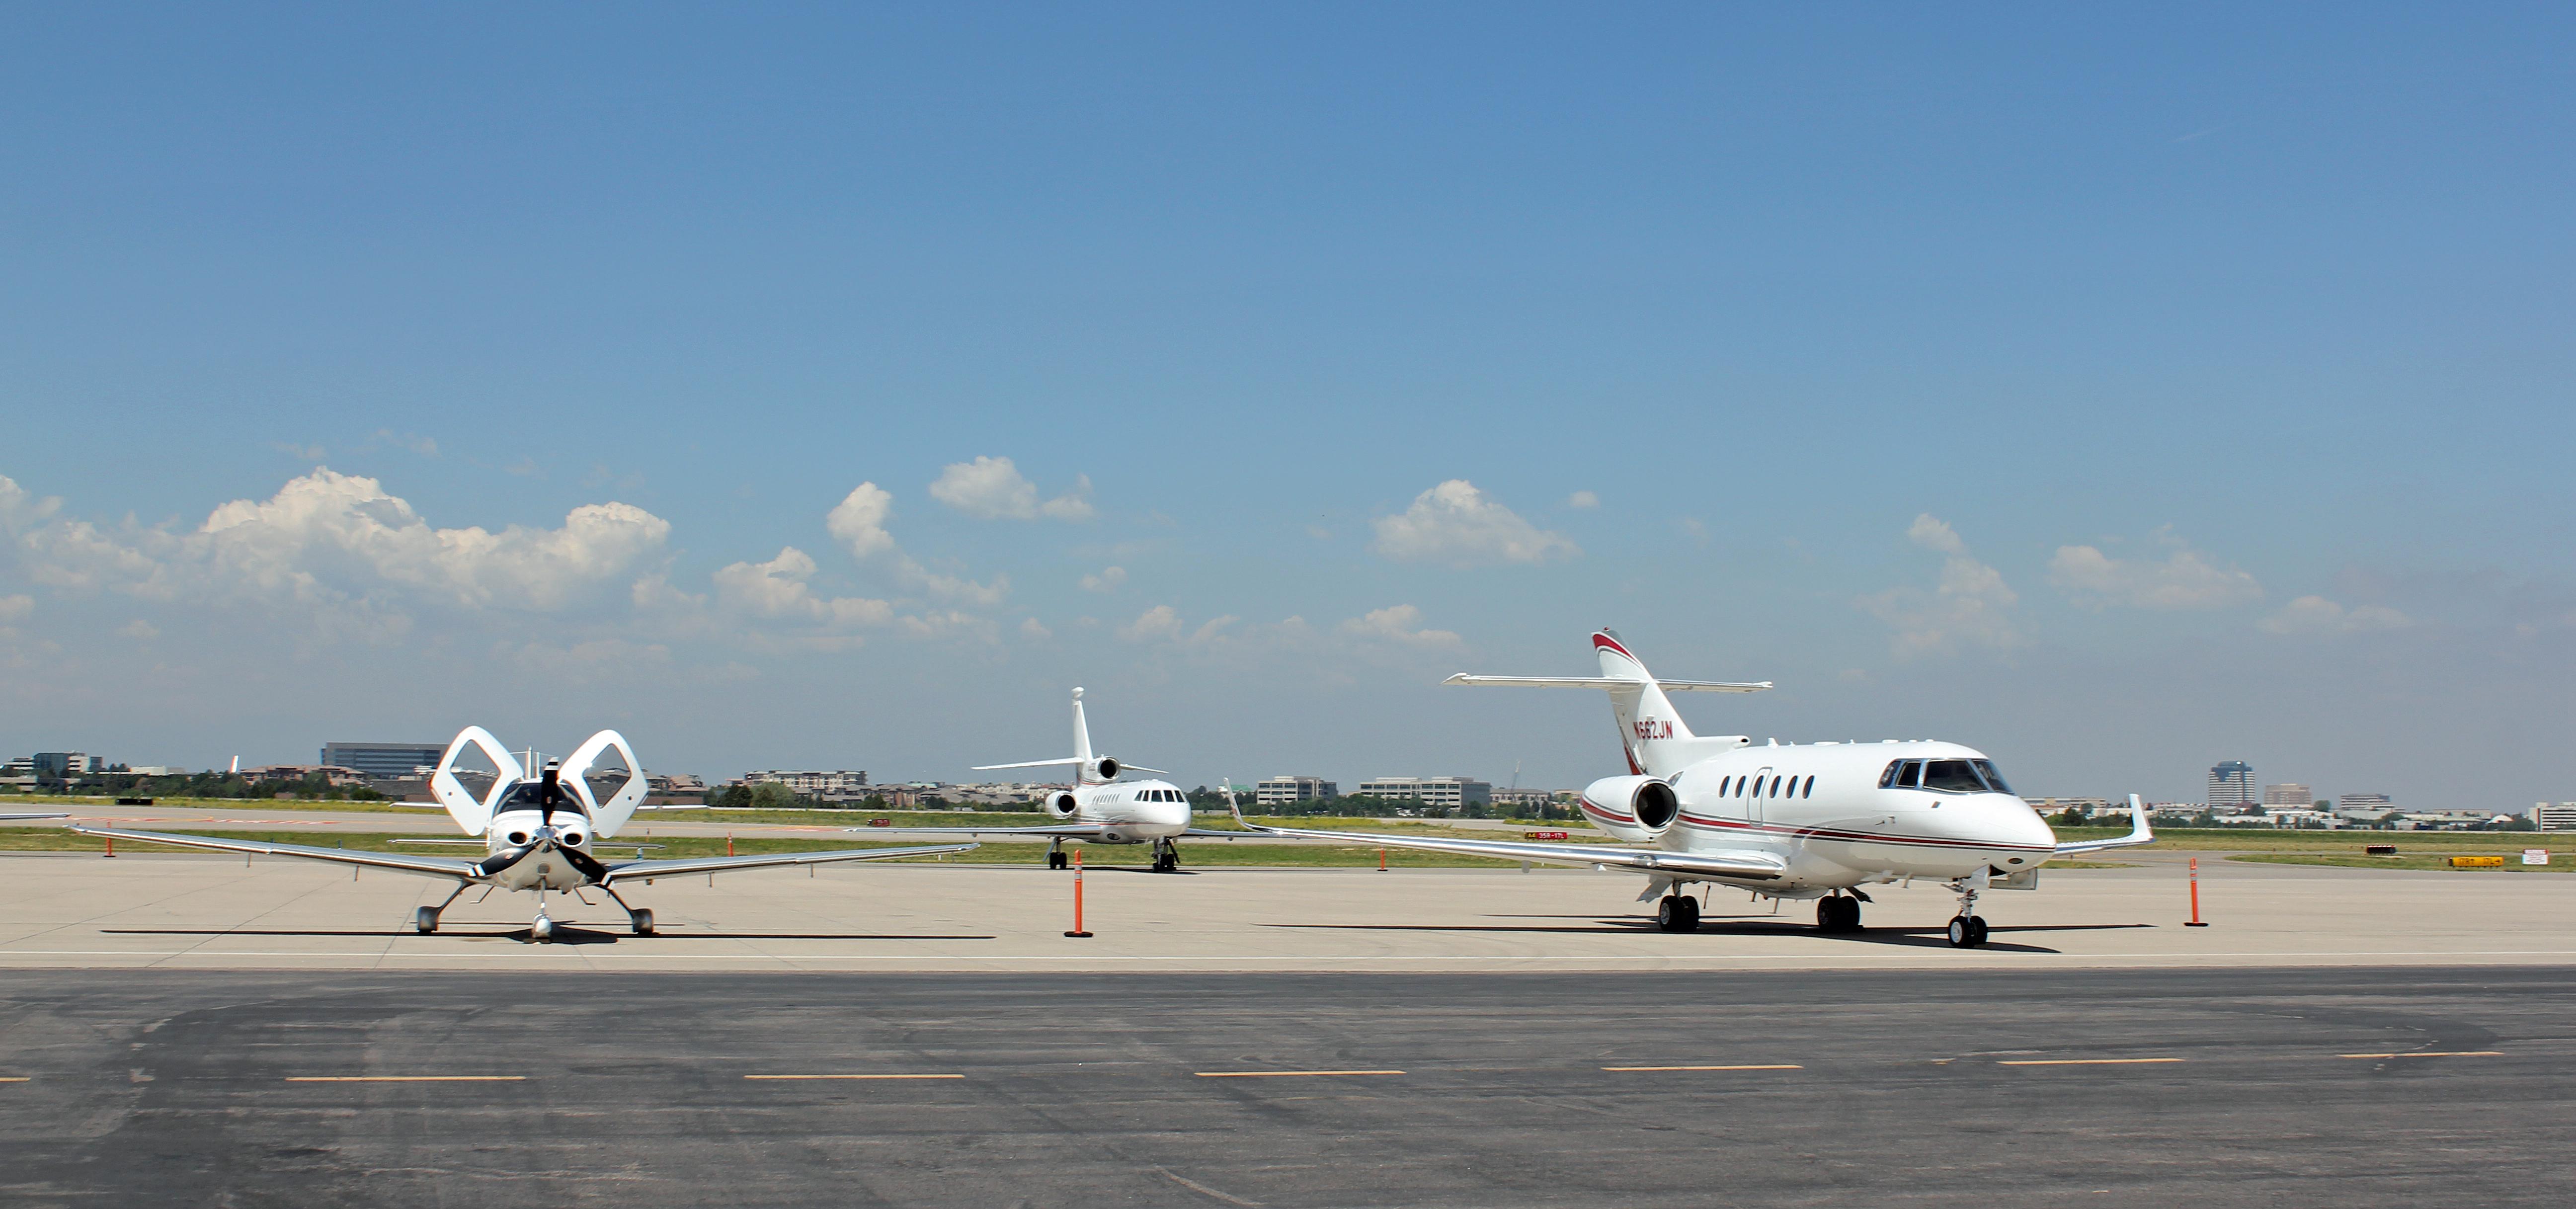 Blue apron engineering - File Centennial Airport Apron Jpg